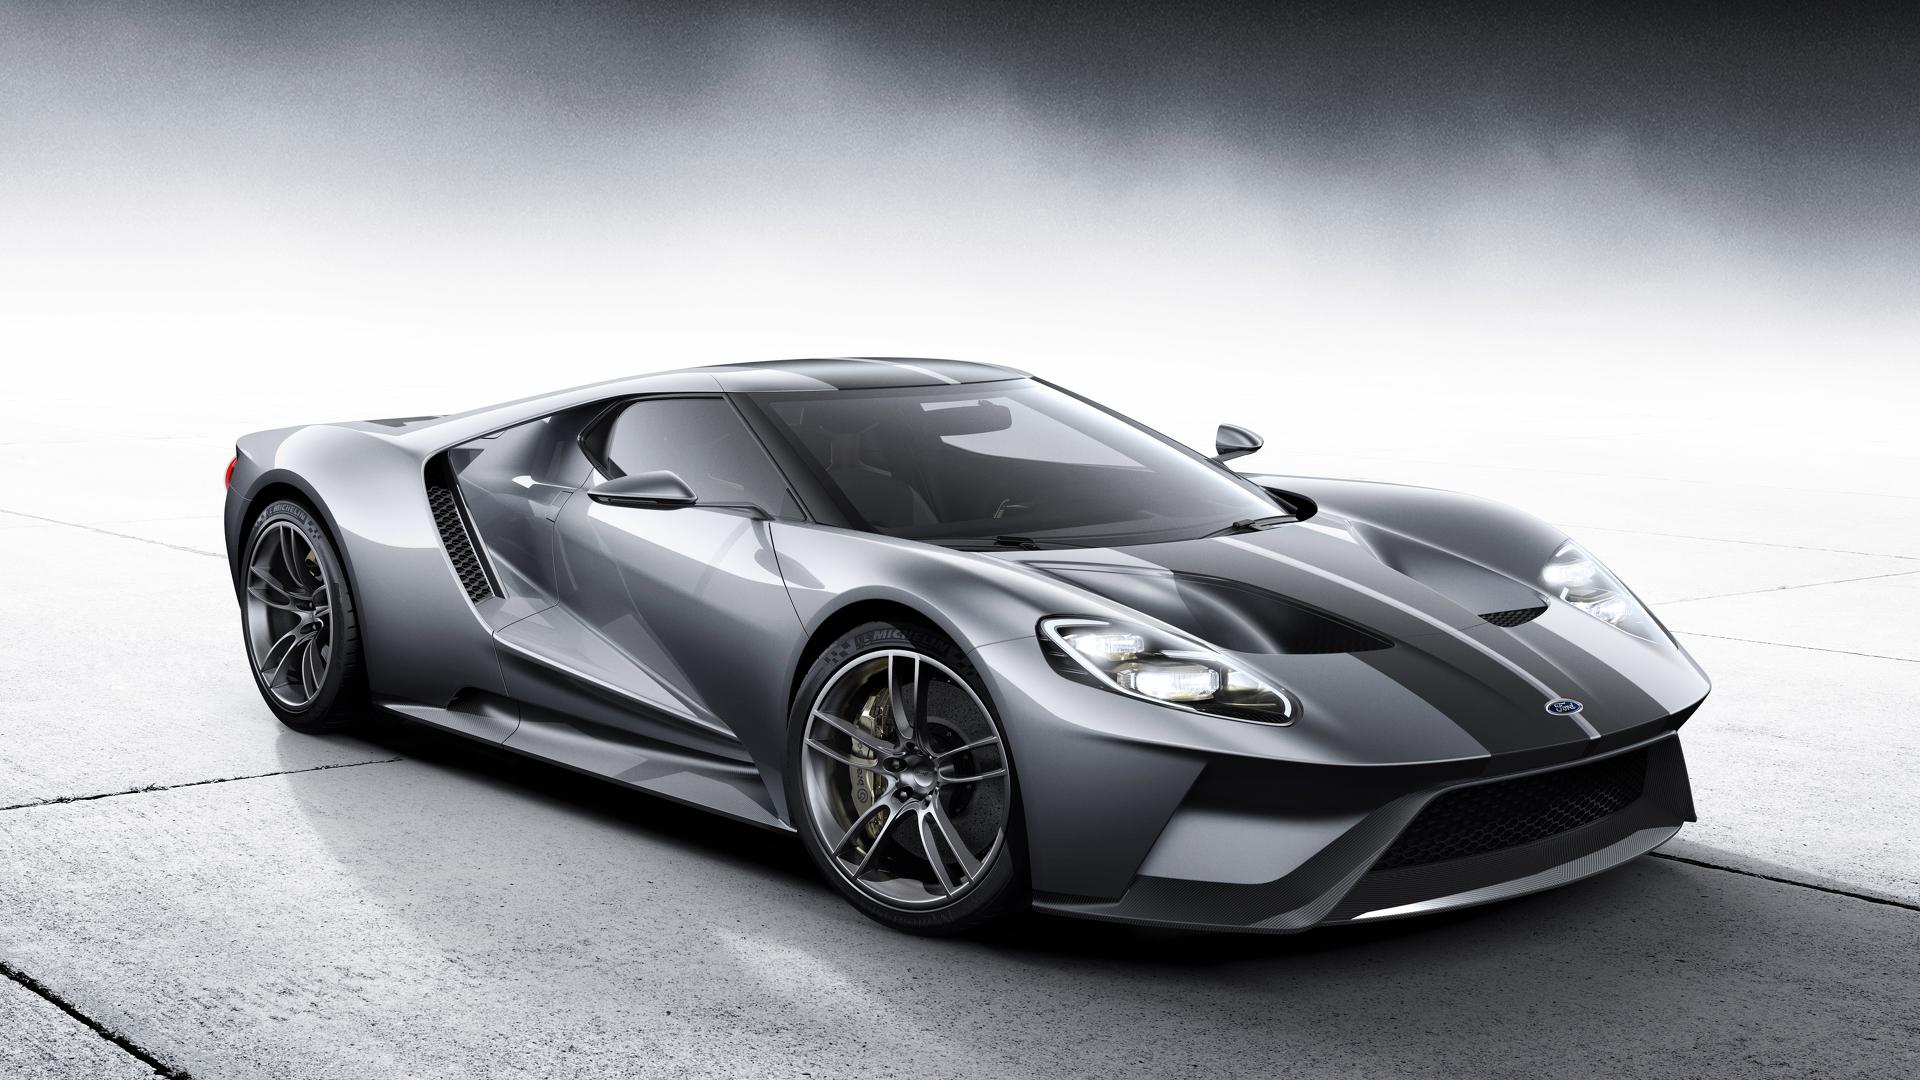 Ford GT News and Reviews  Motor1.com